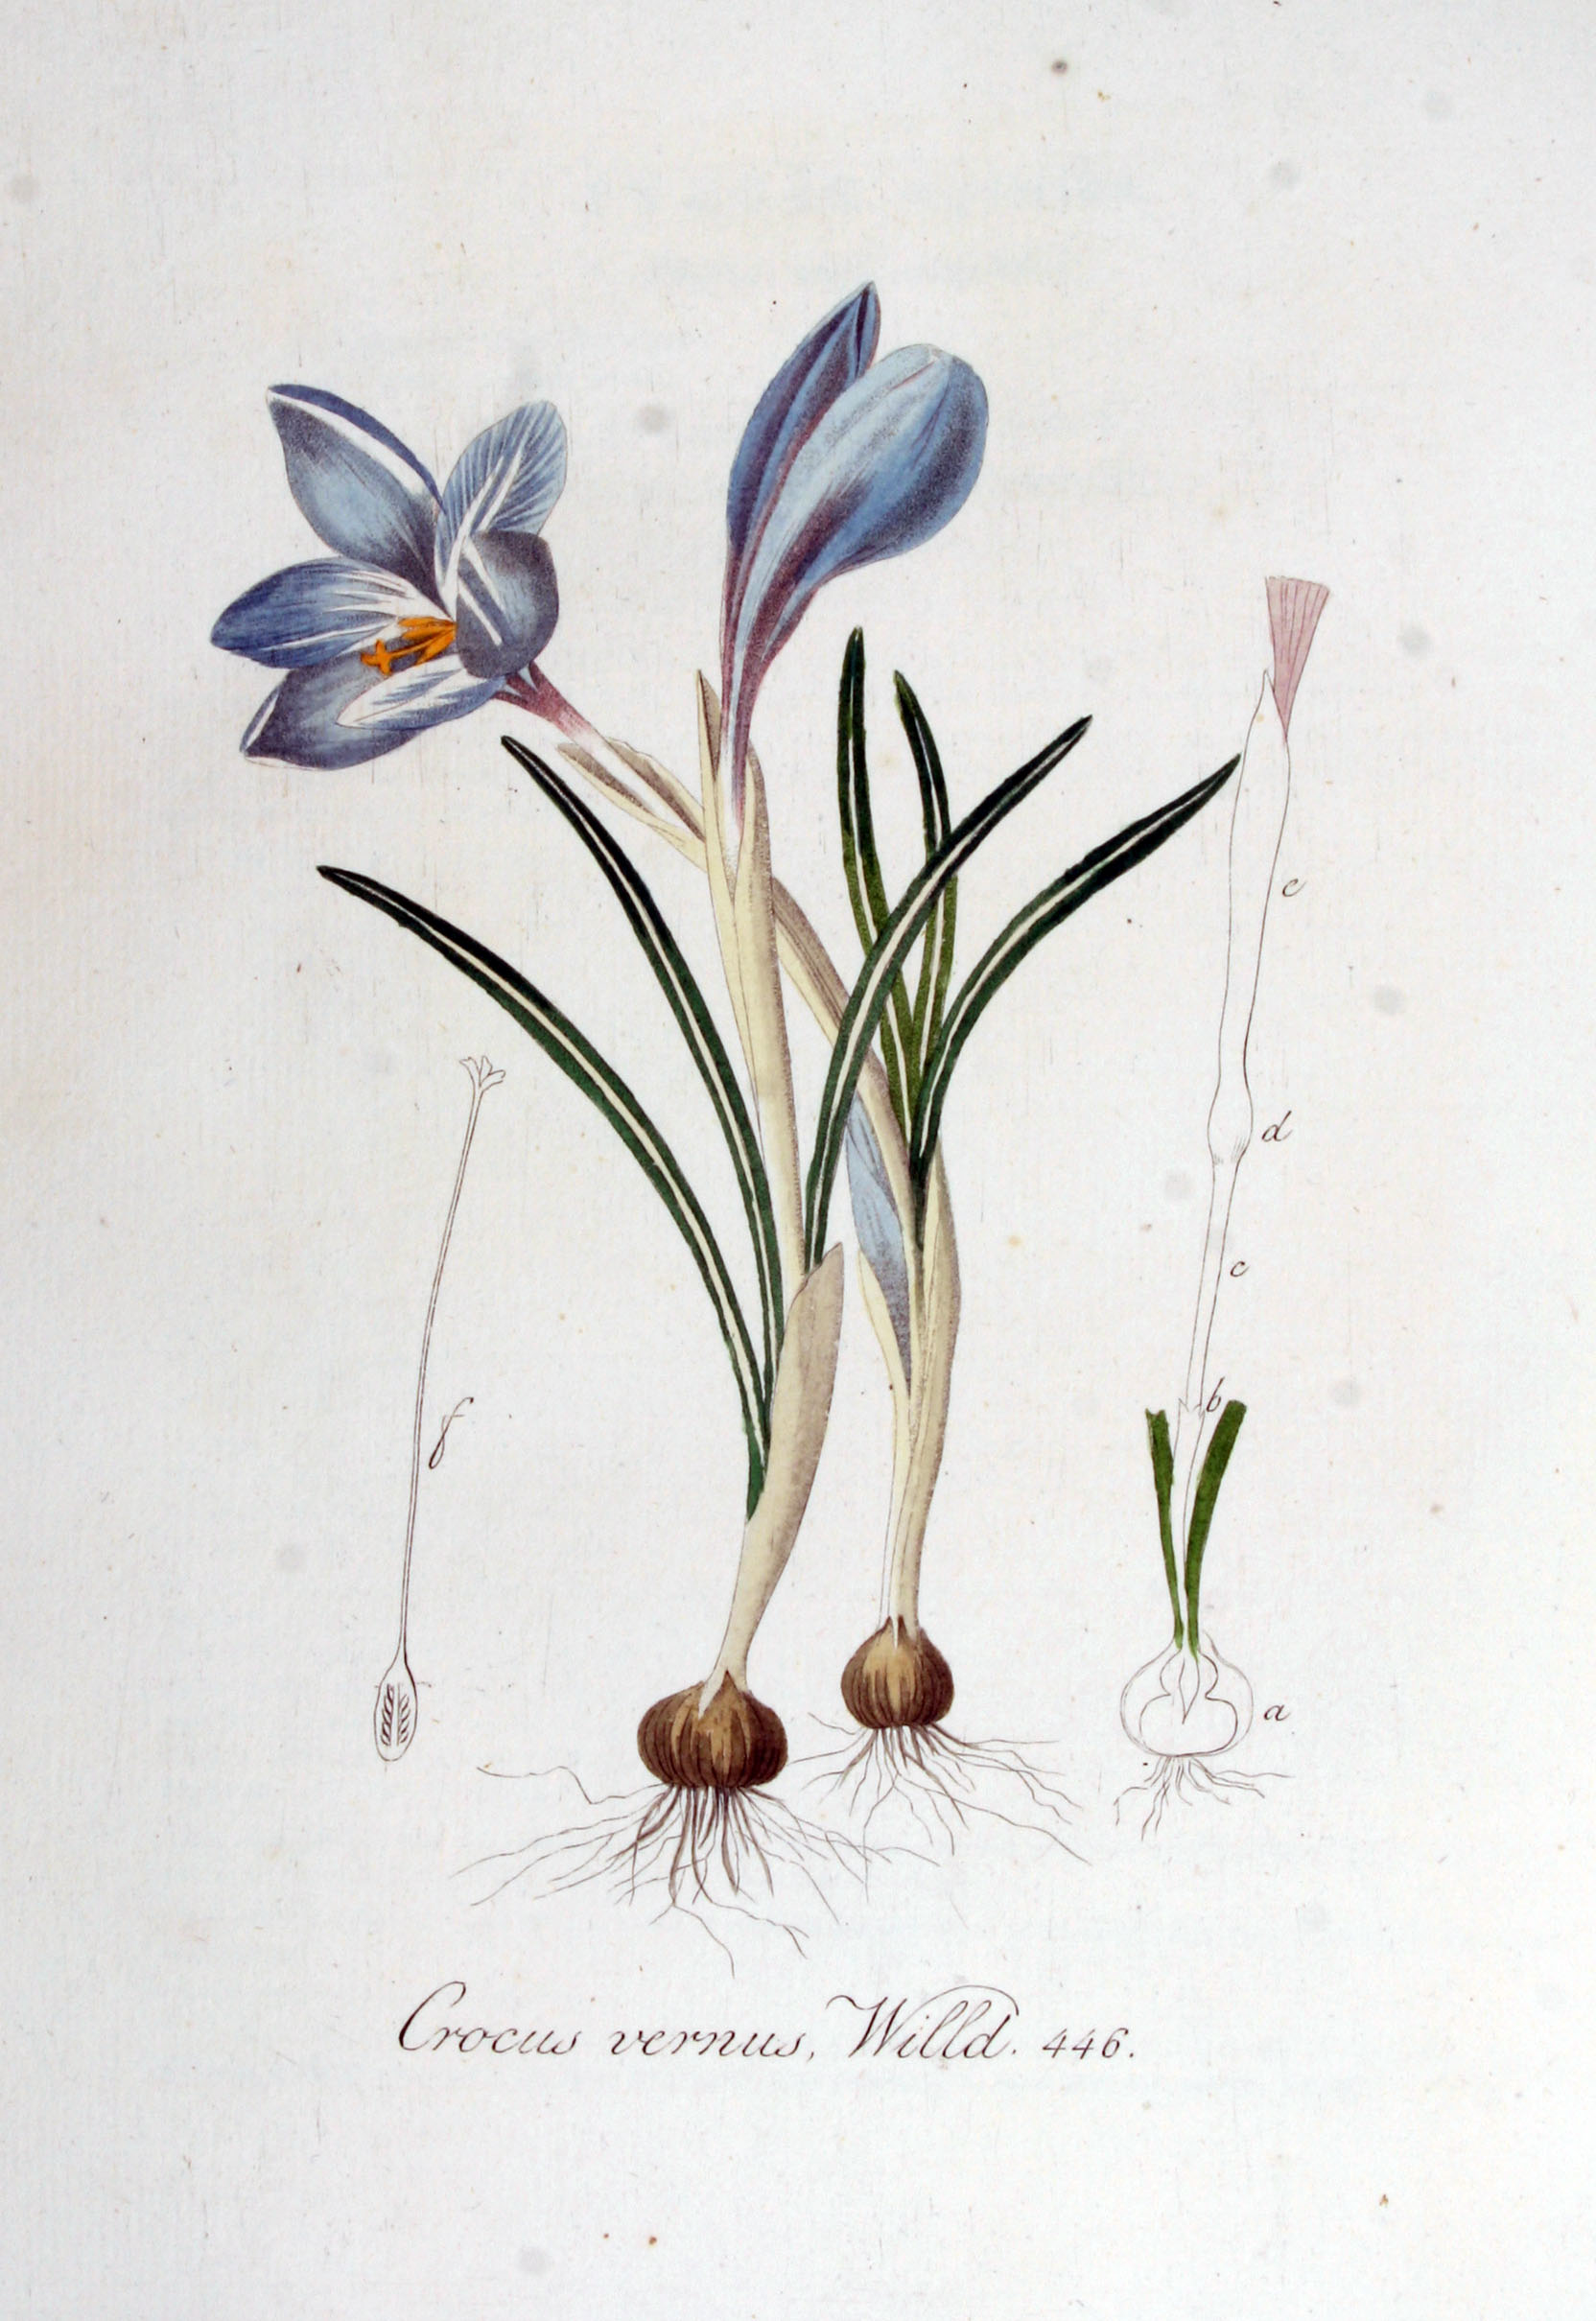 file crocus vernus flora batava volume. Black Bedroom Furniture Sets. Home Design Ideas